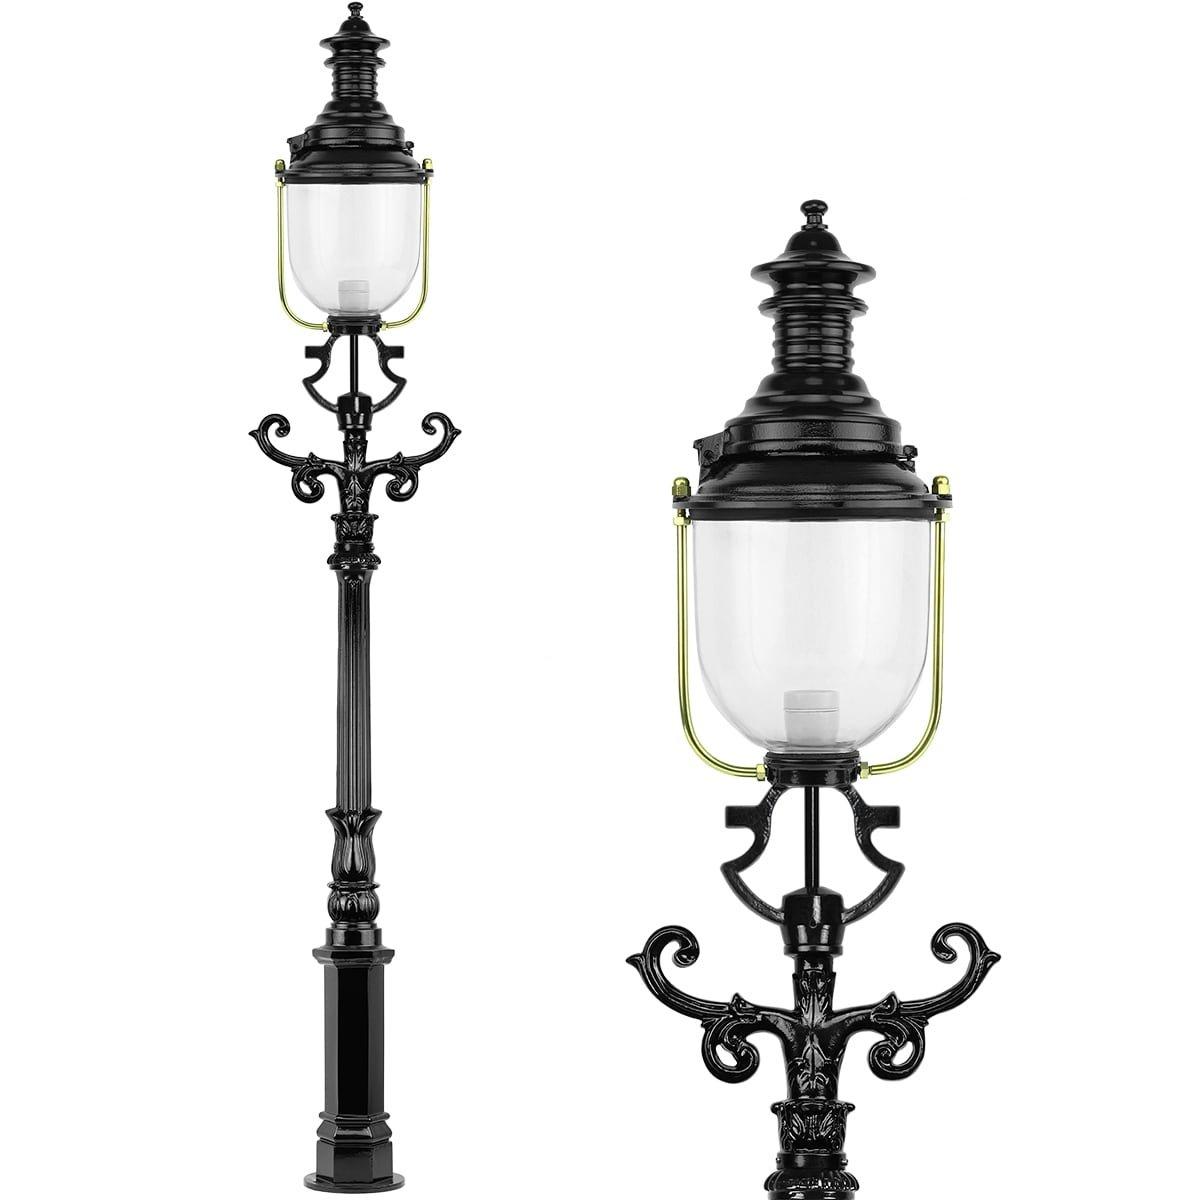 Outdoor Lighting Classic Rural Lantern pole Old English Moerdijk - 240 cm